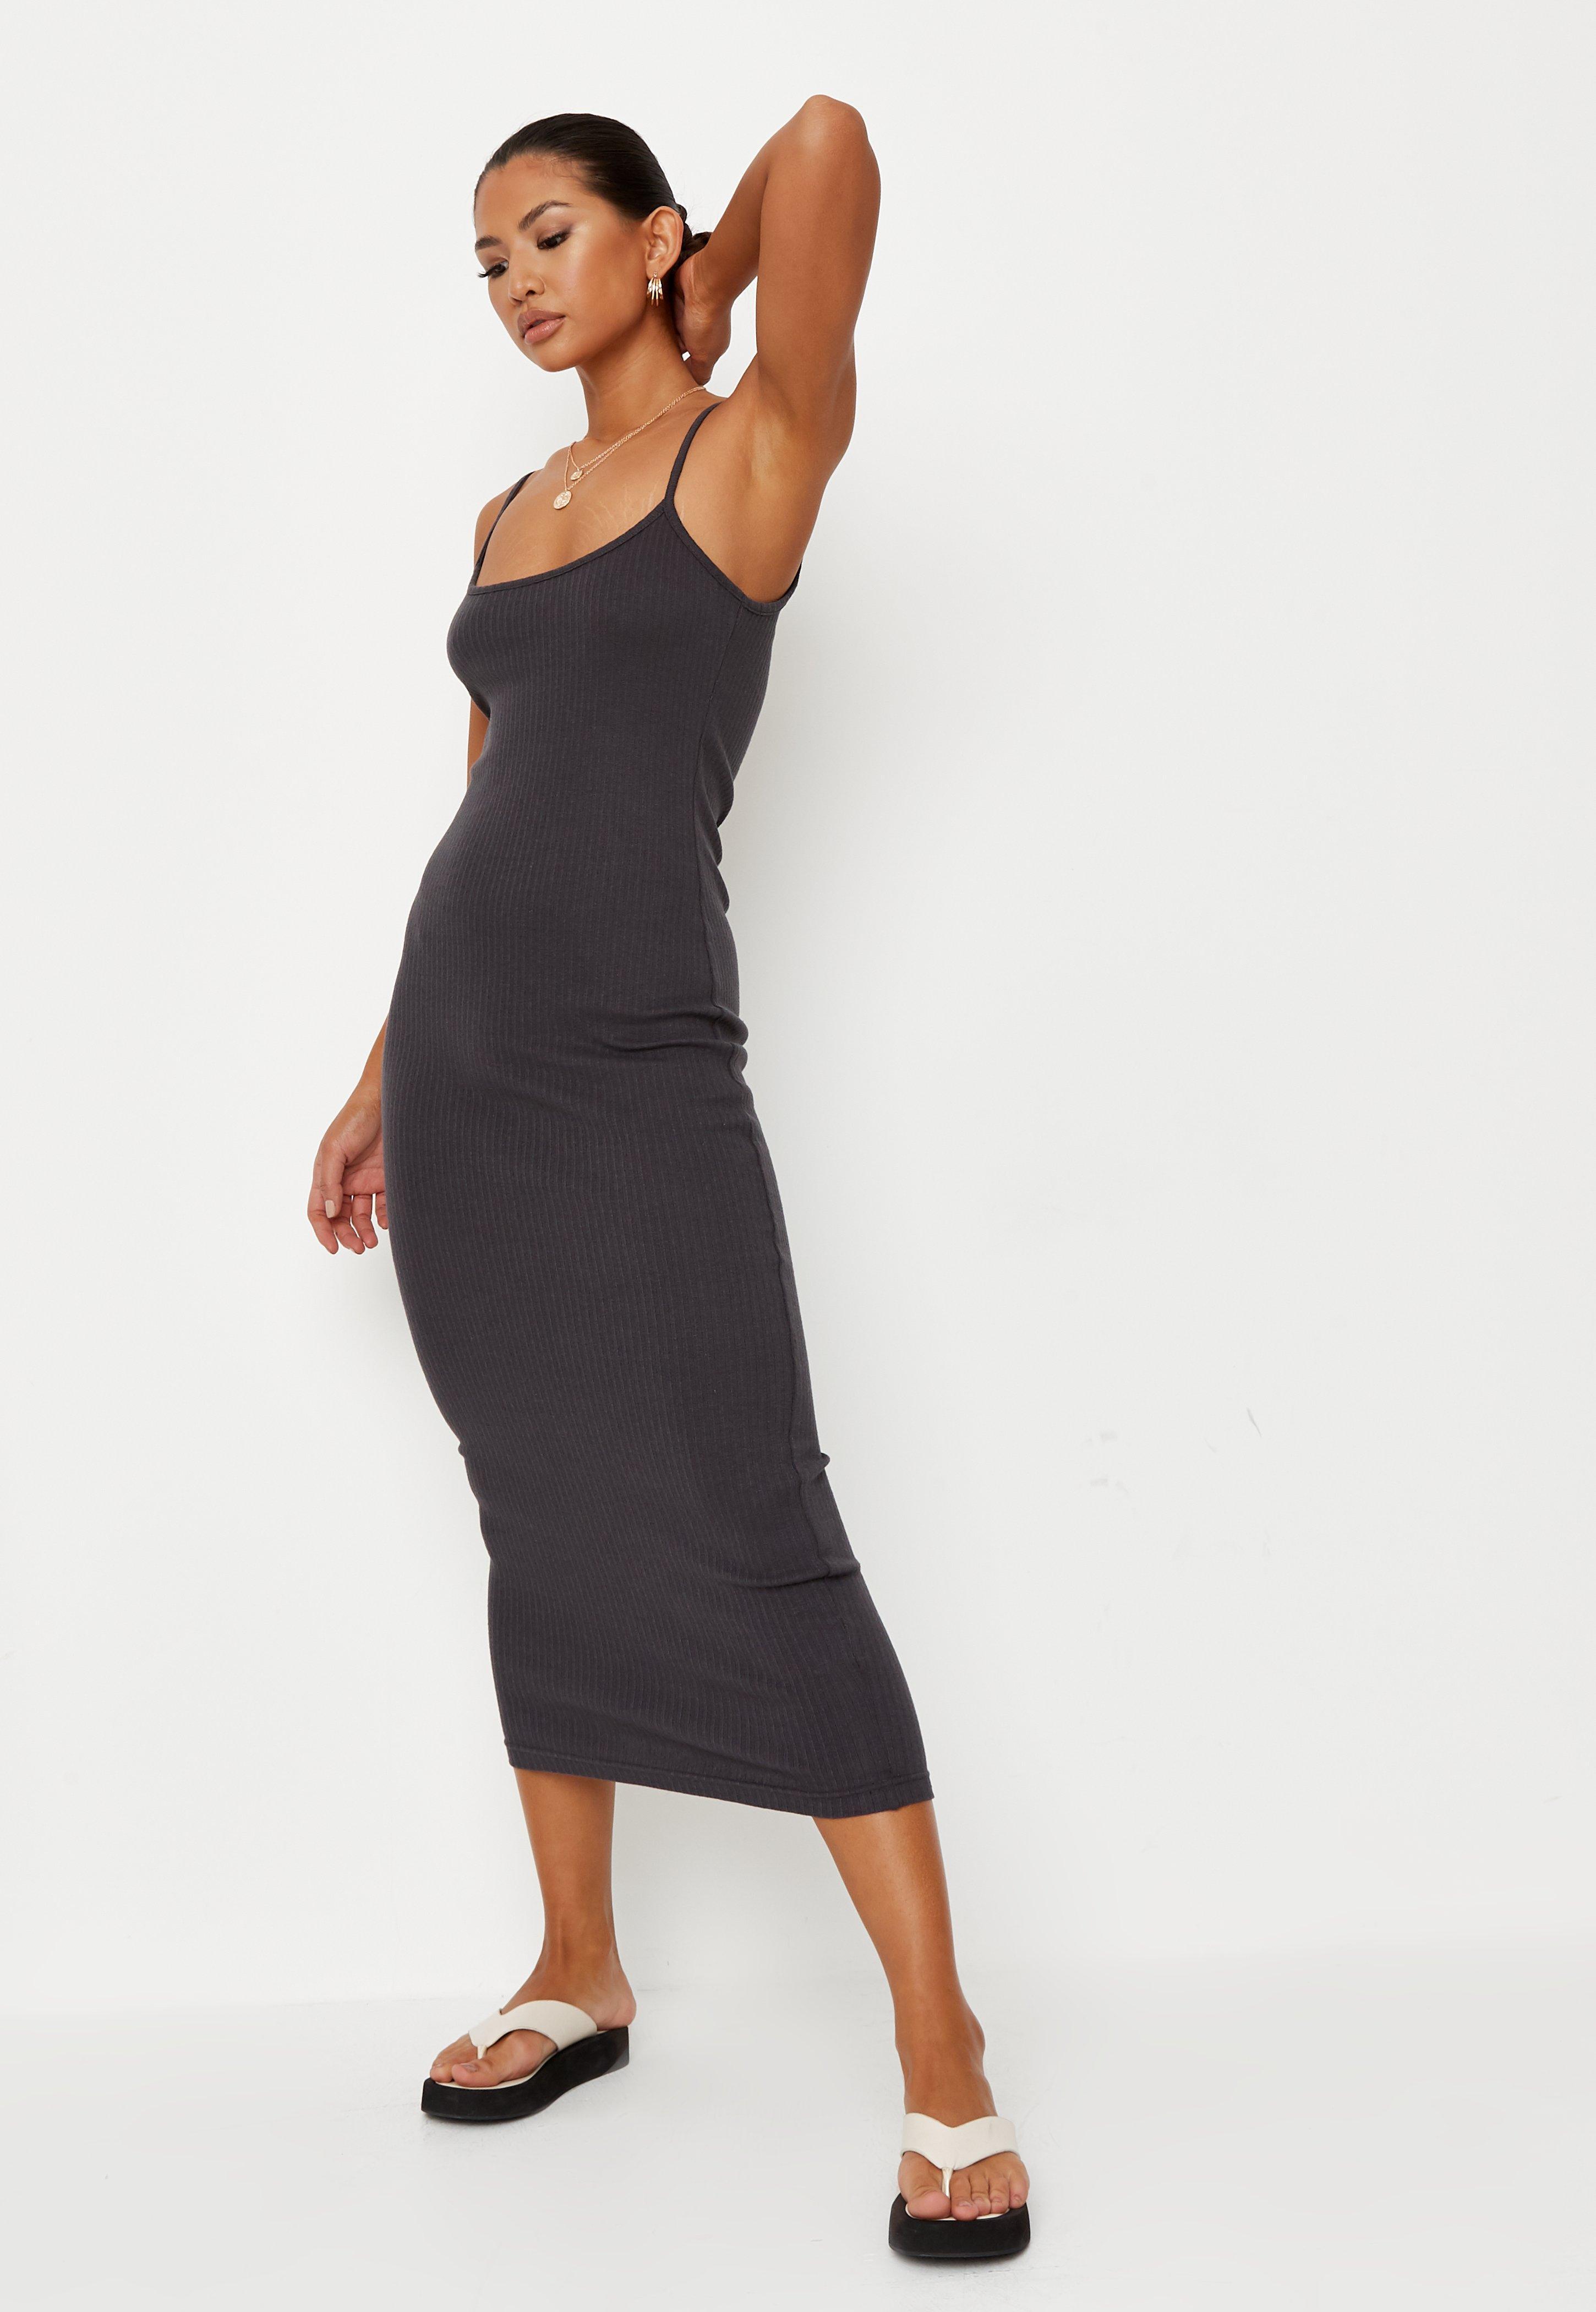 a9358640f0f7a Midi Dresses | Knee Length Dresses - Missguided